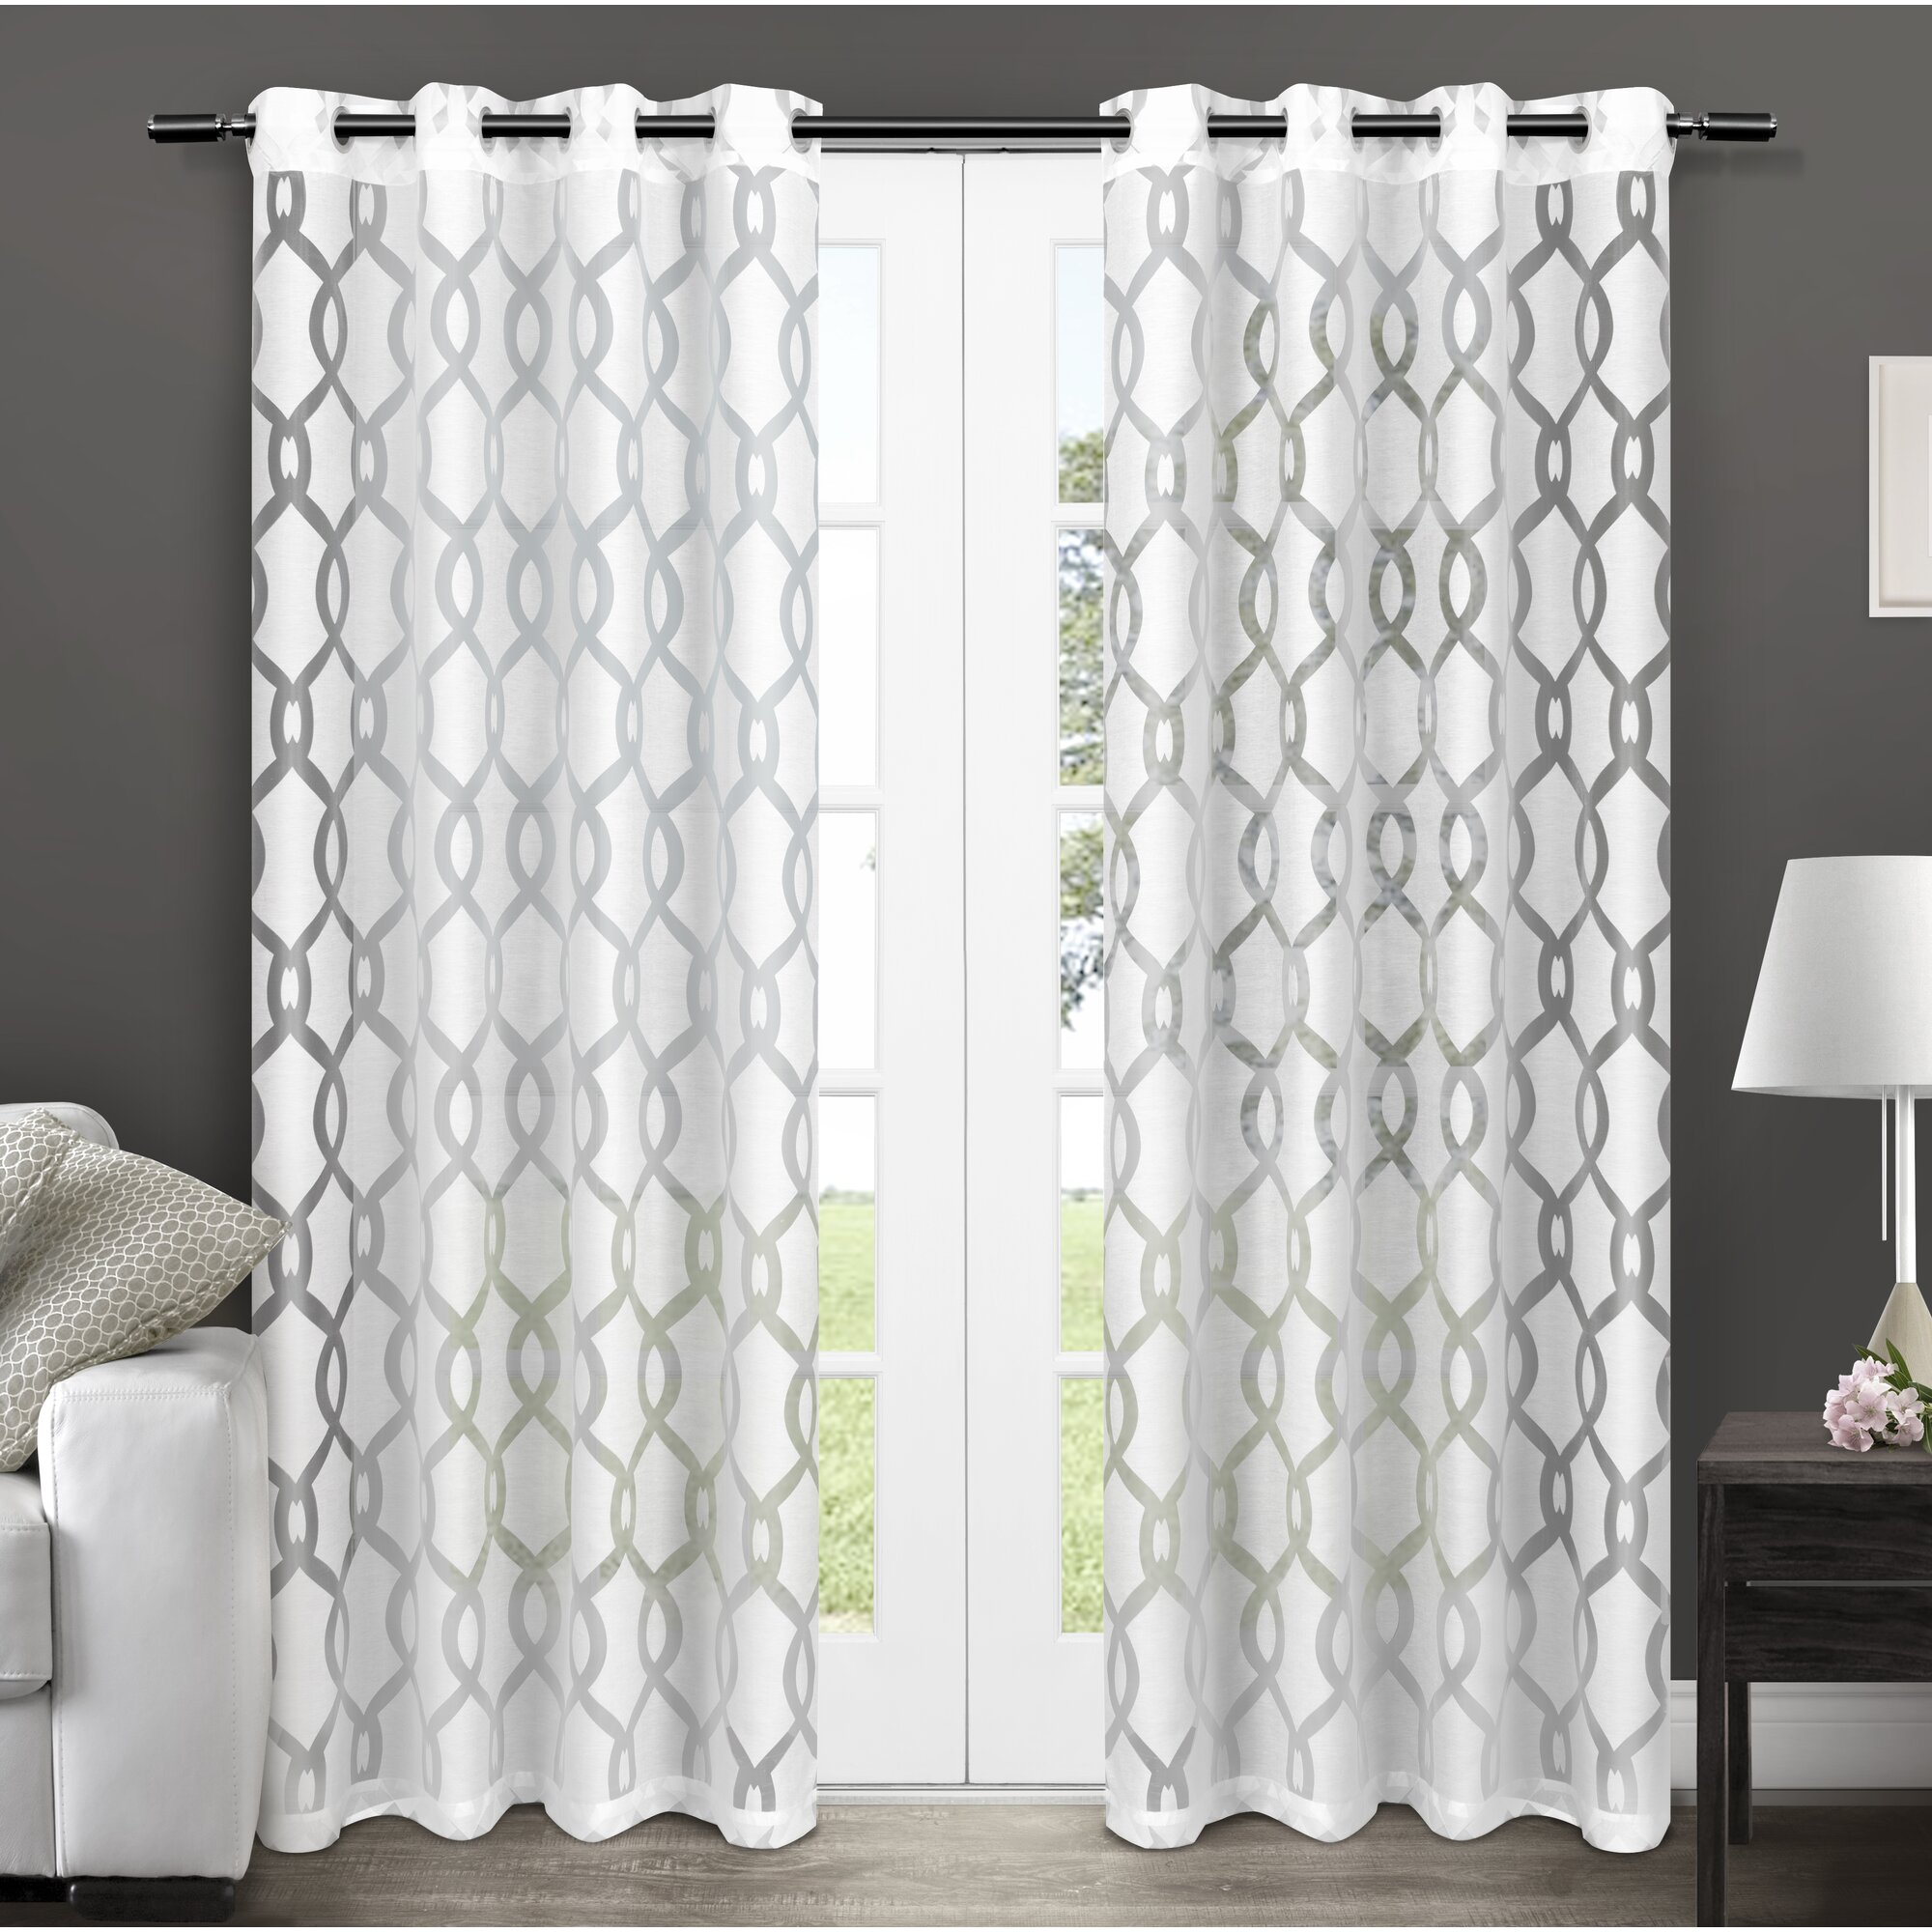 House Of Hampton Hadley Geometric Sheer Curtain Panels